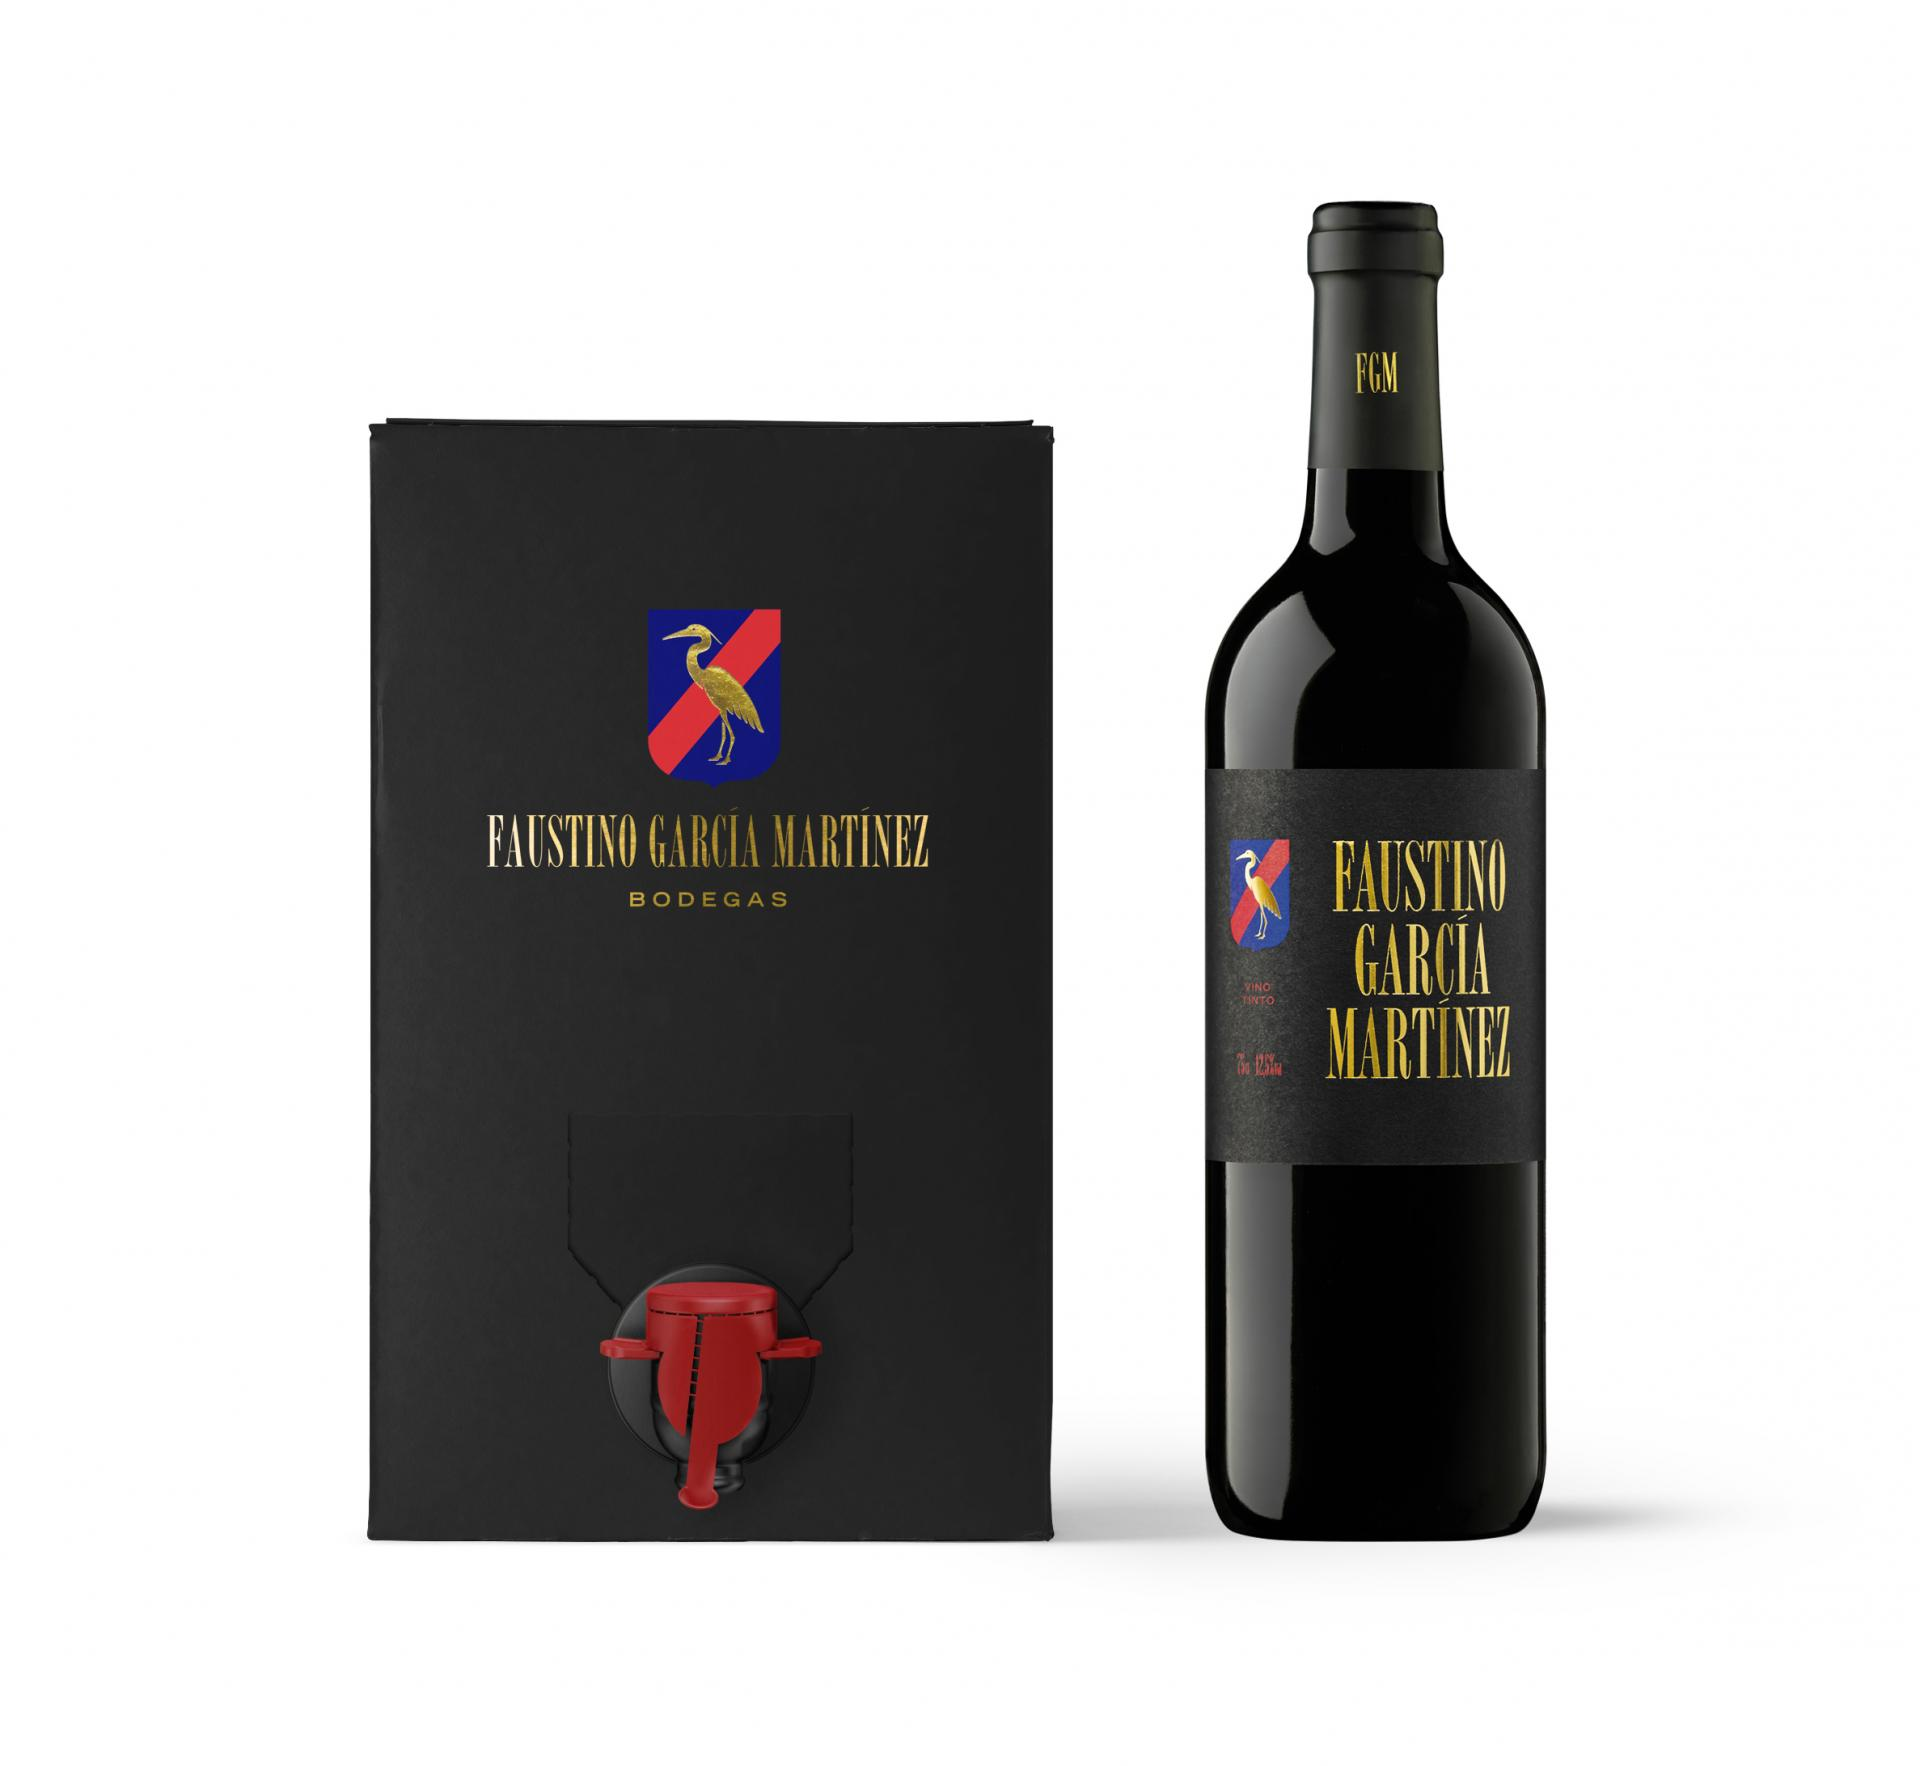 Vino TINTO envejecido 6 MESES. Faustino García Martinez. Bag in box 5L